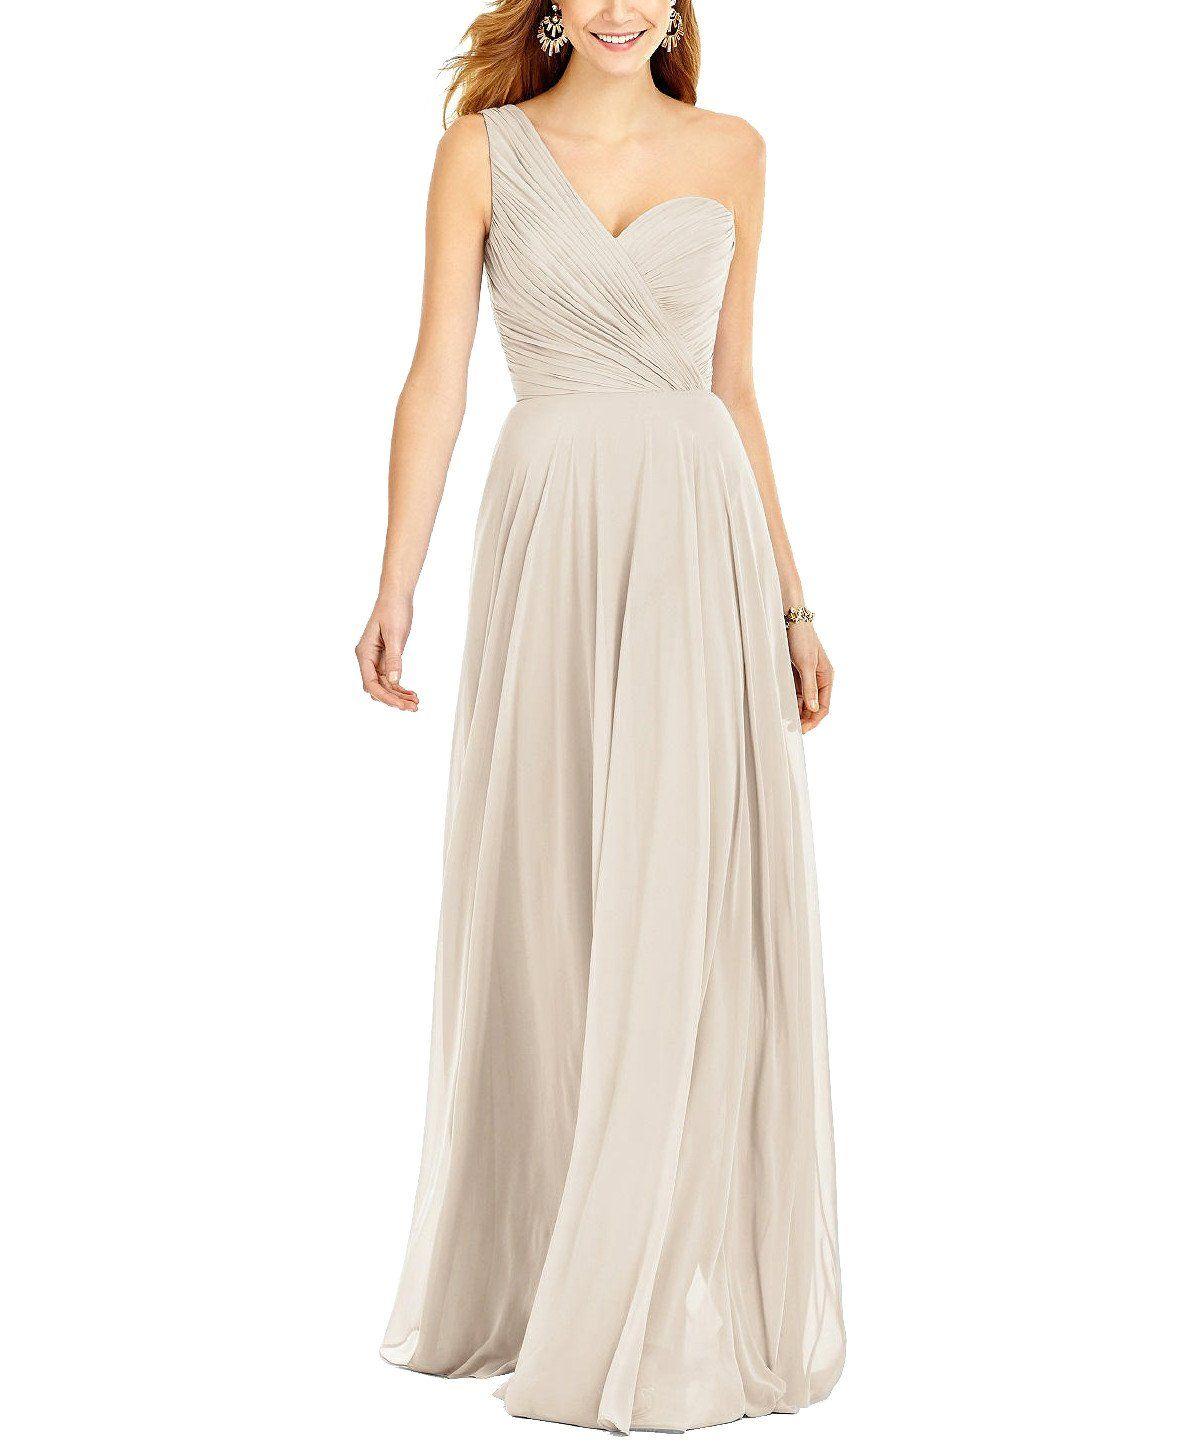 eb0a6e6f873 After Six 6751. After Six 6751 Dessy Bridesmaid Dresses ...